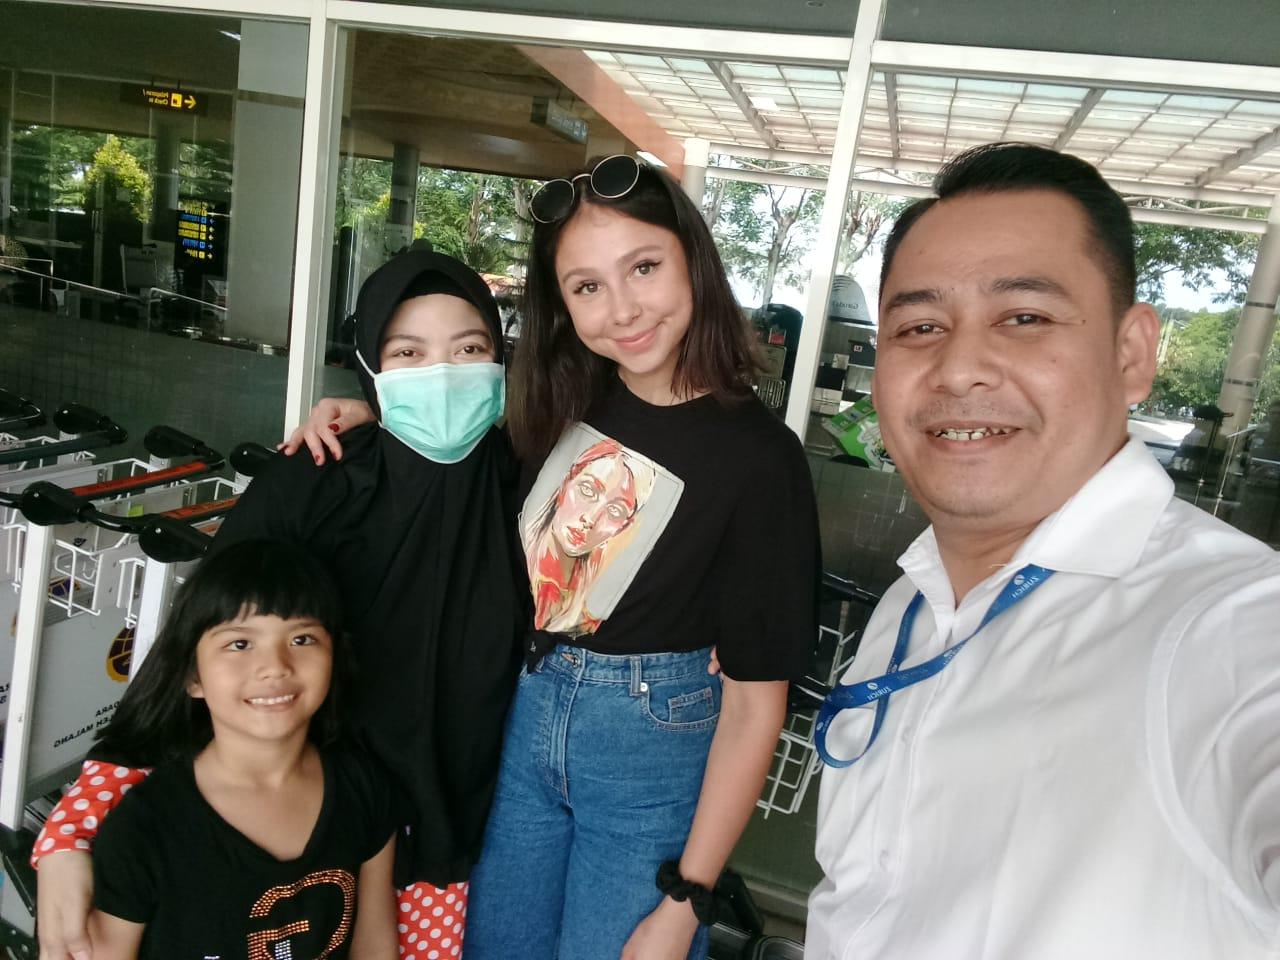 Karinas Gastfamilie